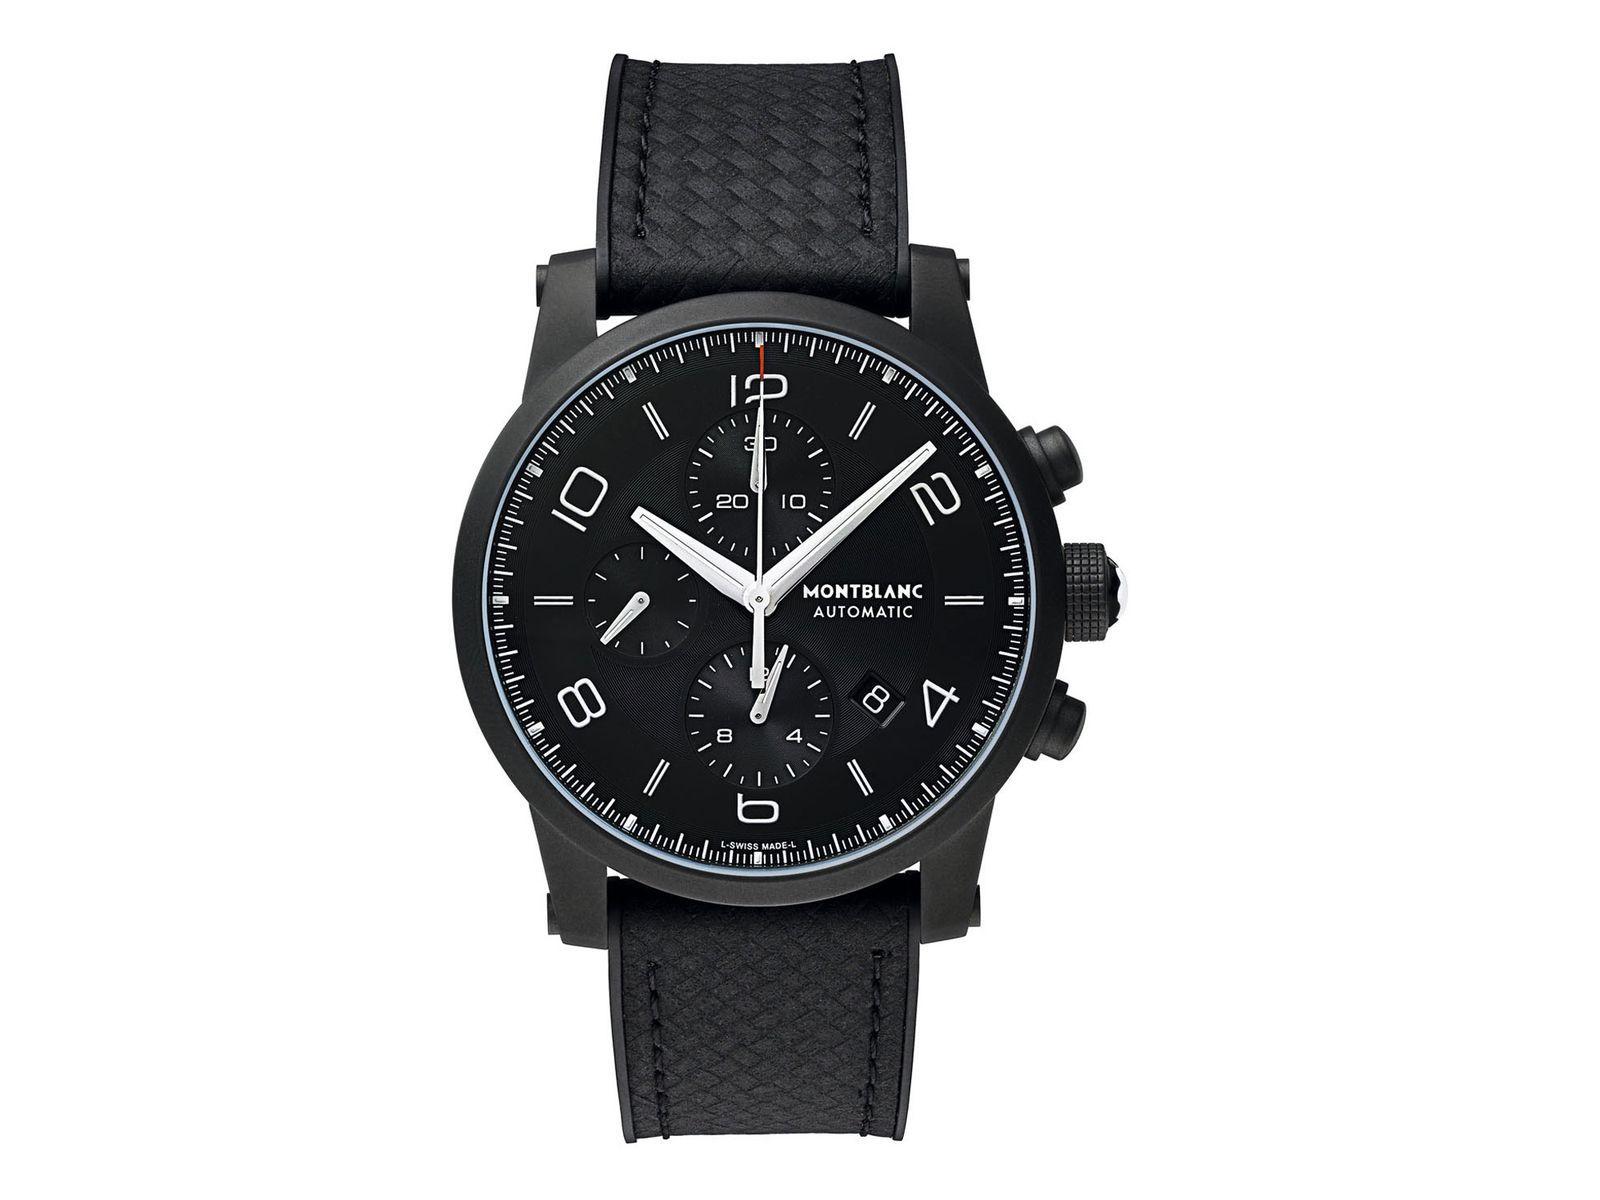 83ac5dd242c Montblanc TimeWalker Urban Speed Chronograph e-Strap